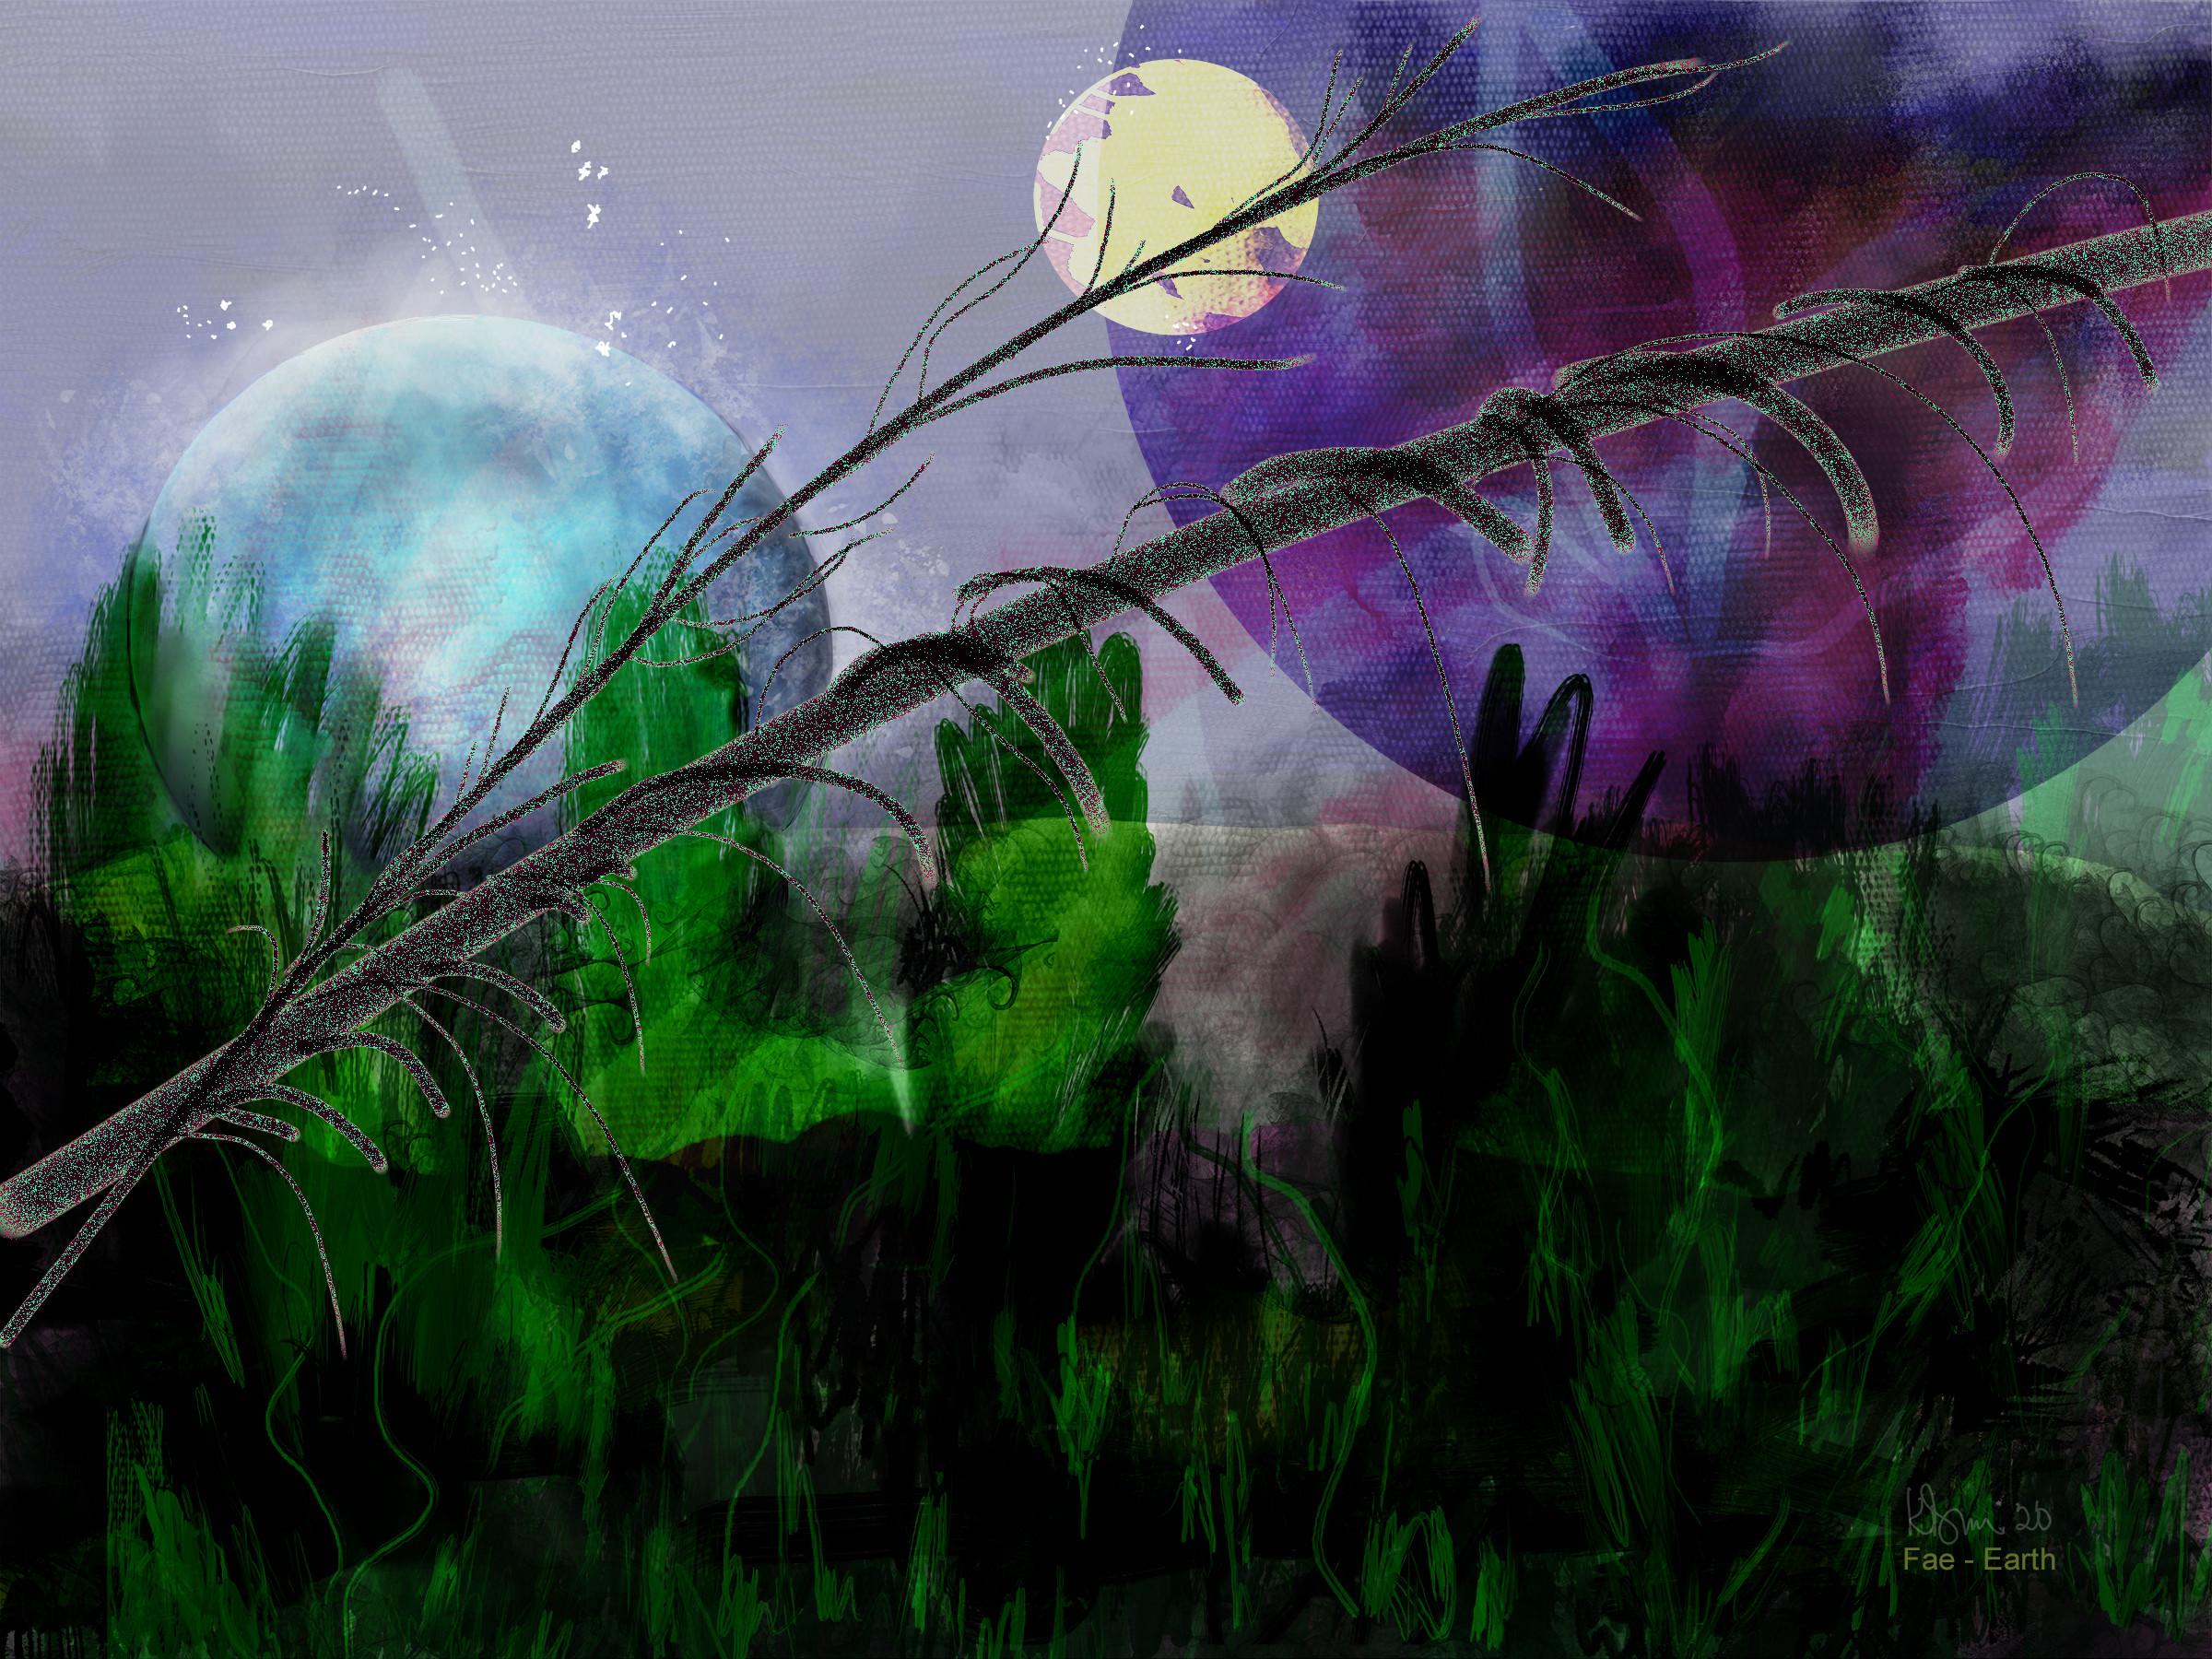 Us to You - Earth Fae :: Channeled Interdimensional Art